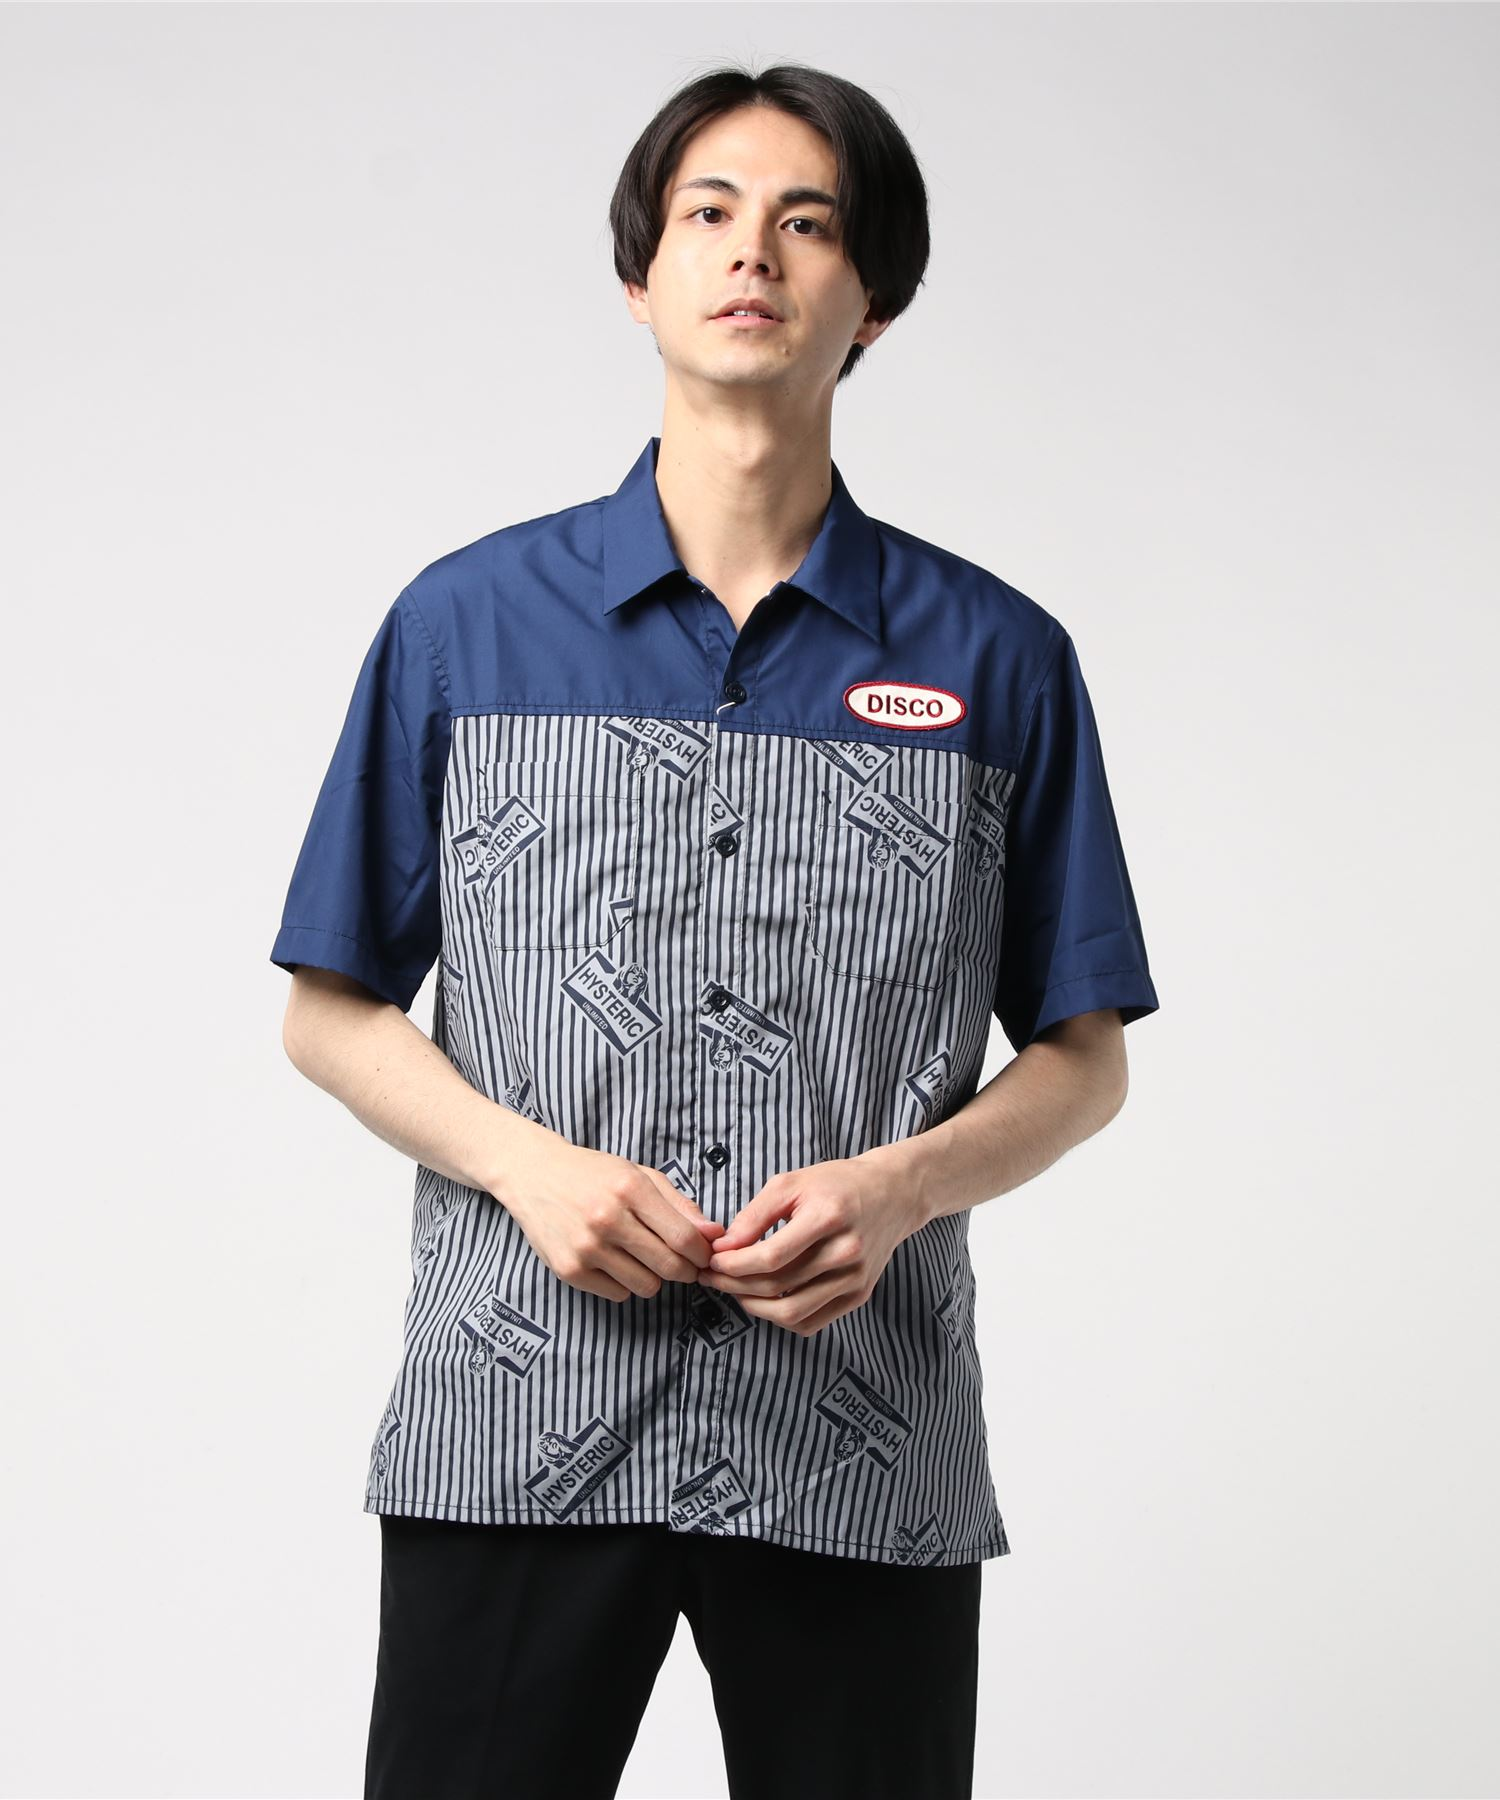 DISCOワッペン 半袖エンジニアシャツ